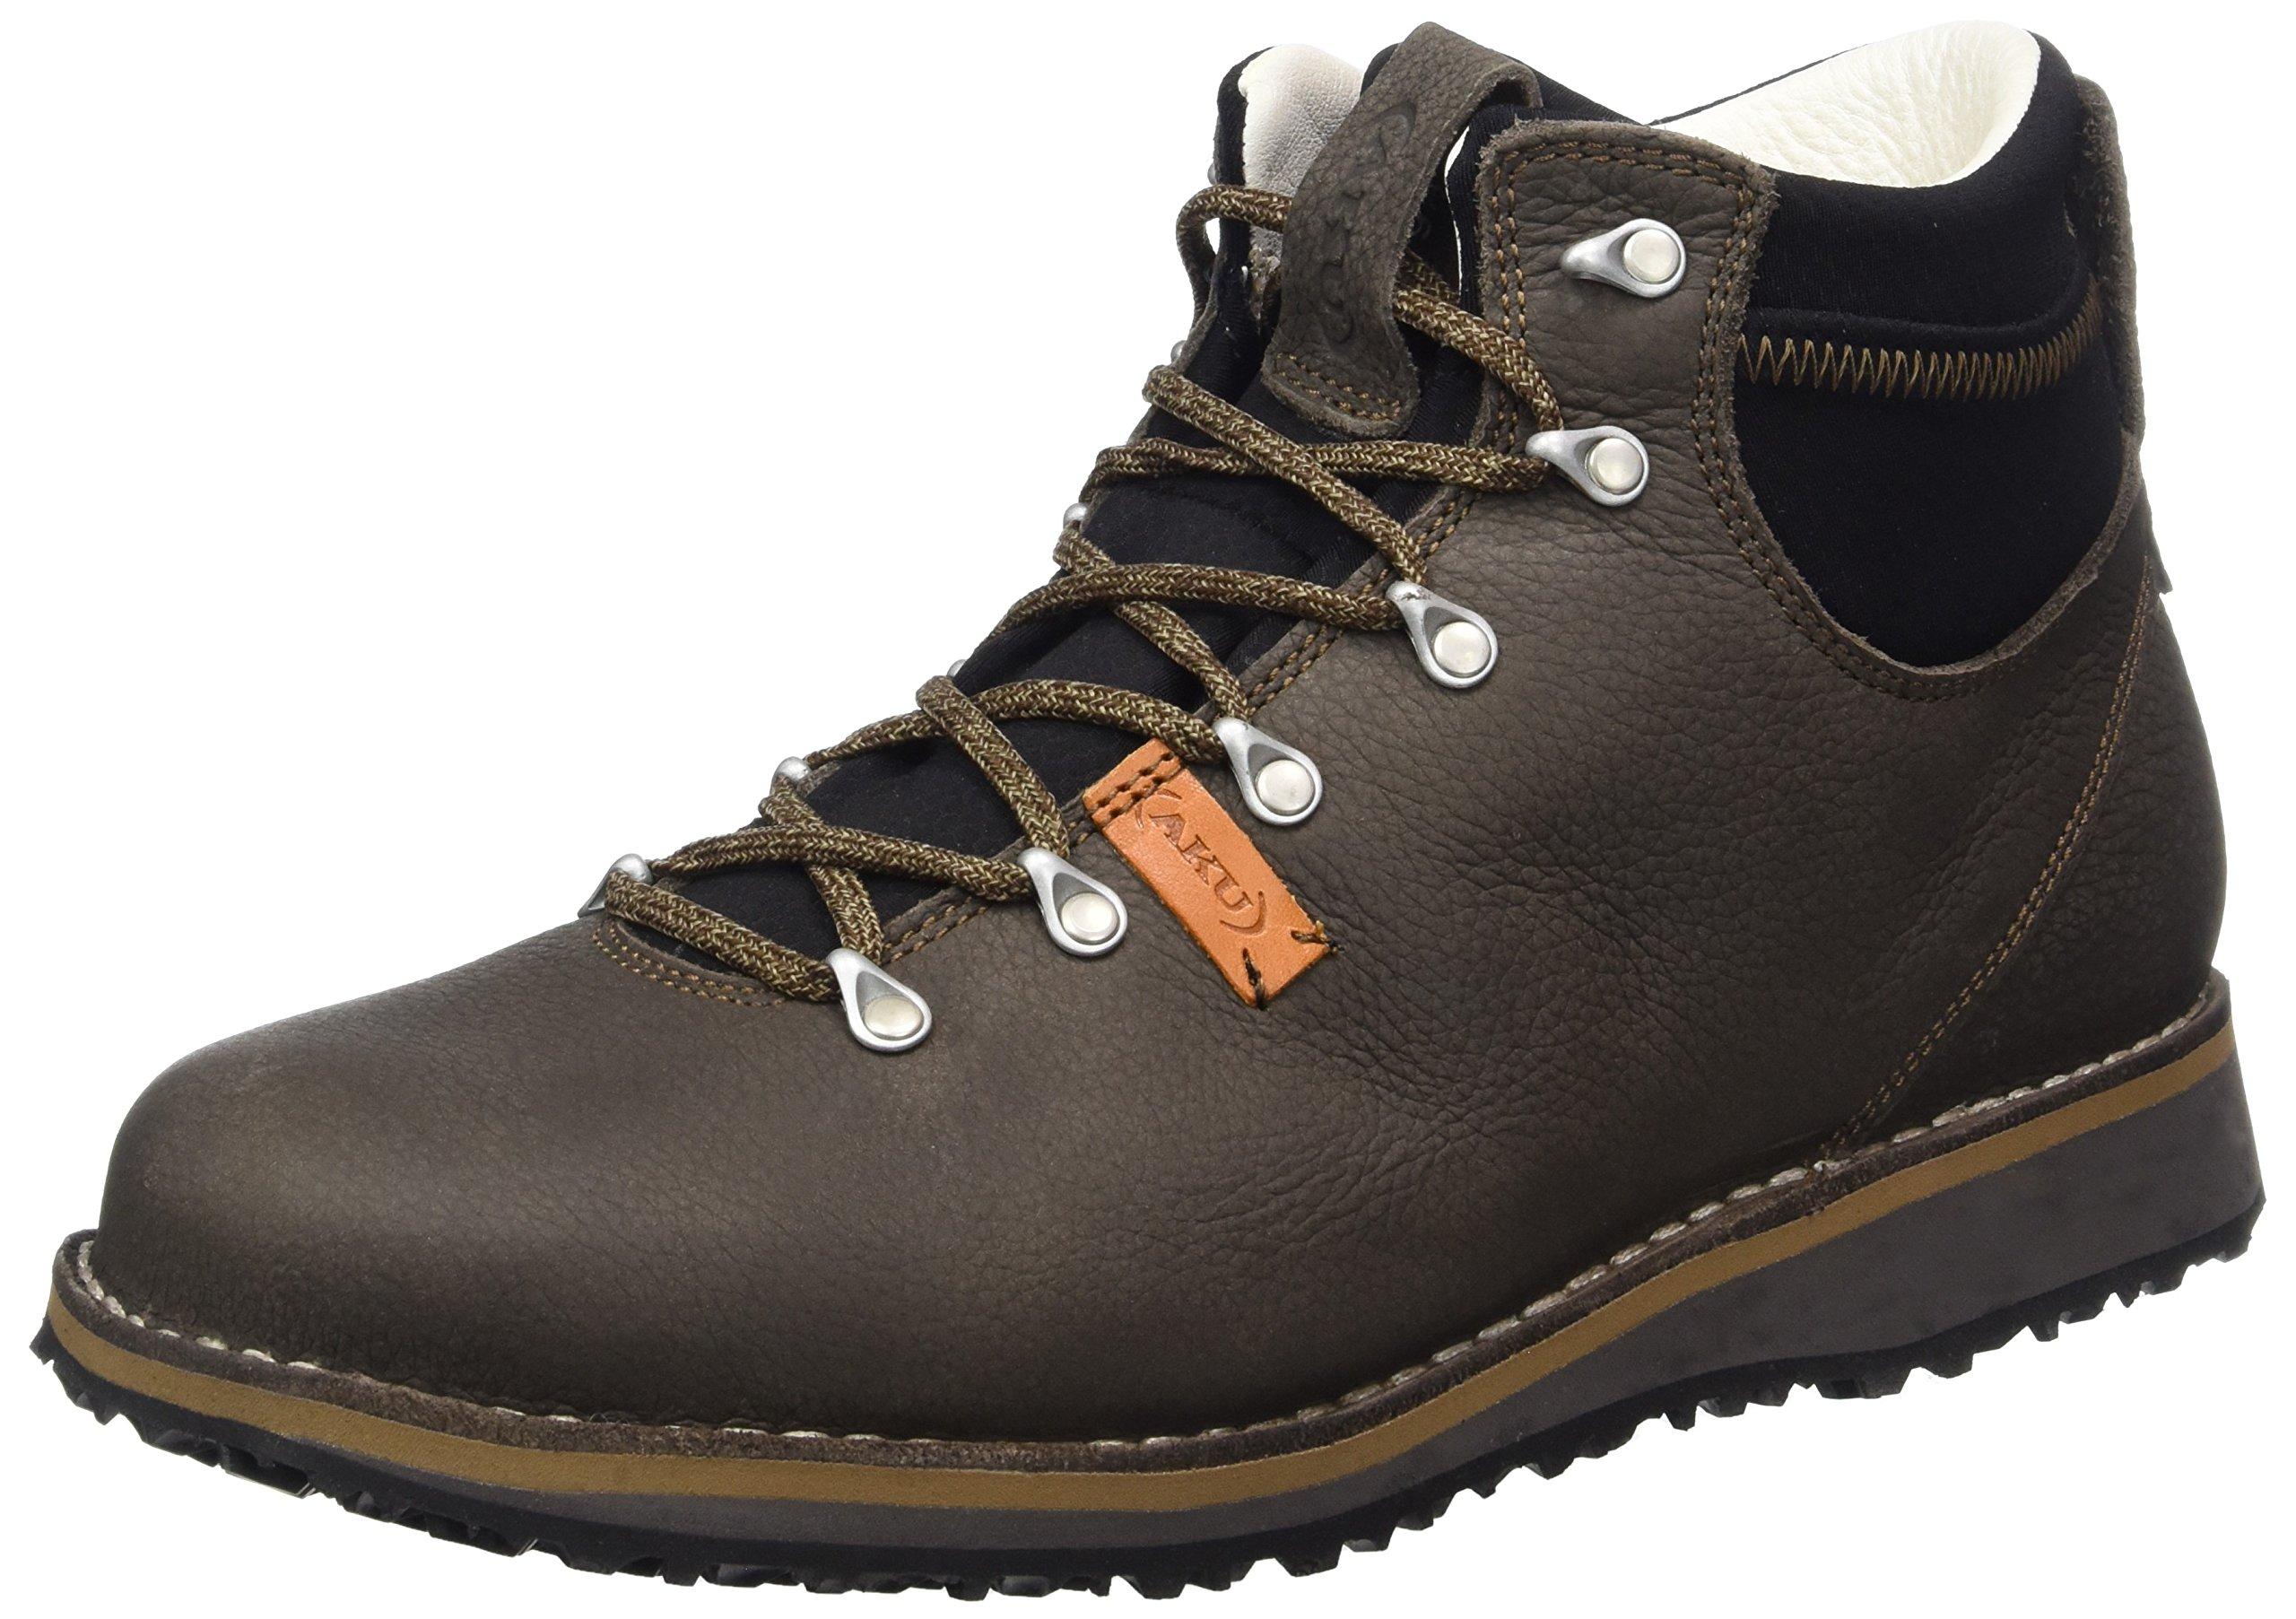 81OCjSgZH8L - AKU Unisex Adults' Badia Plus High Rise Hiking Boots